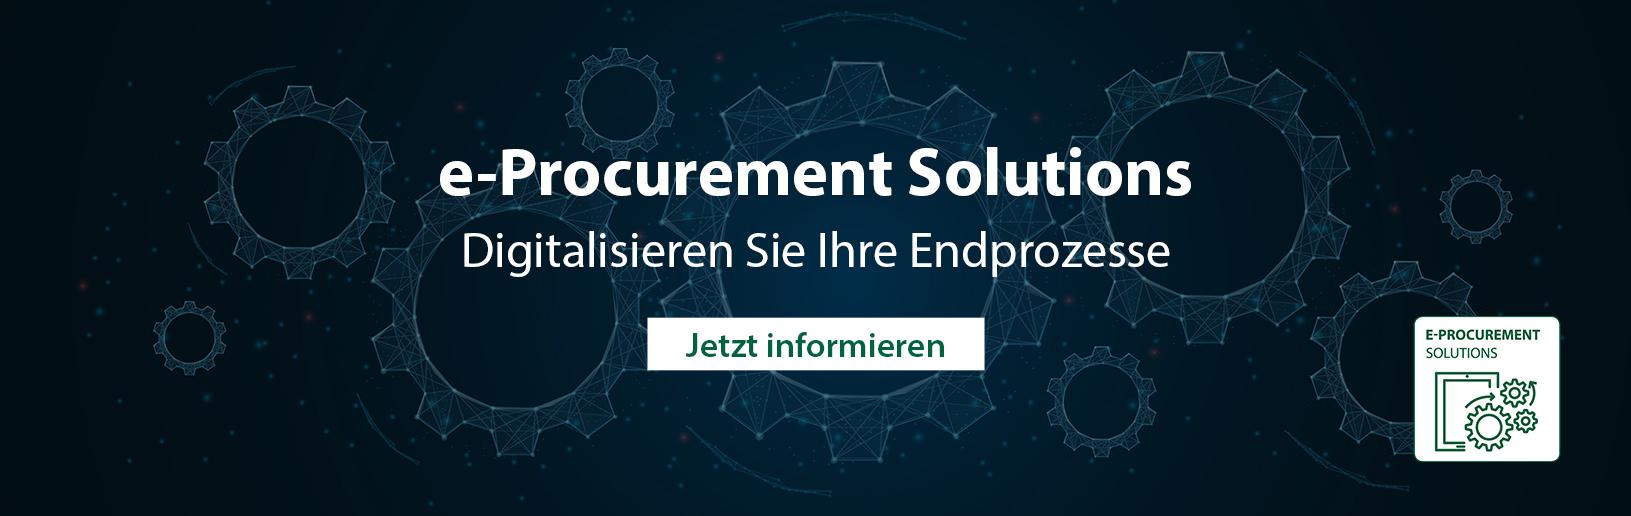 eProcurement Solutions